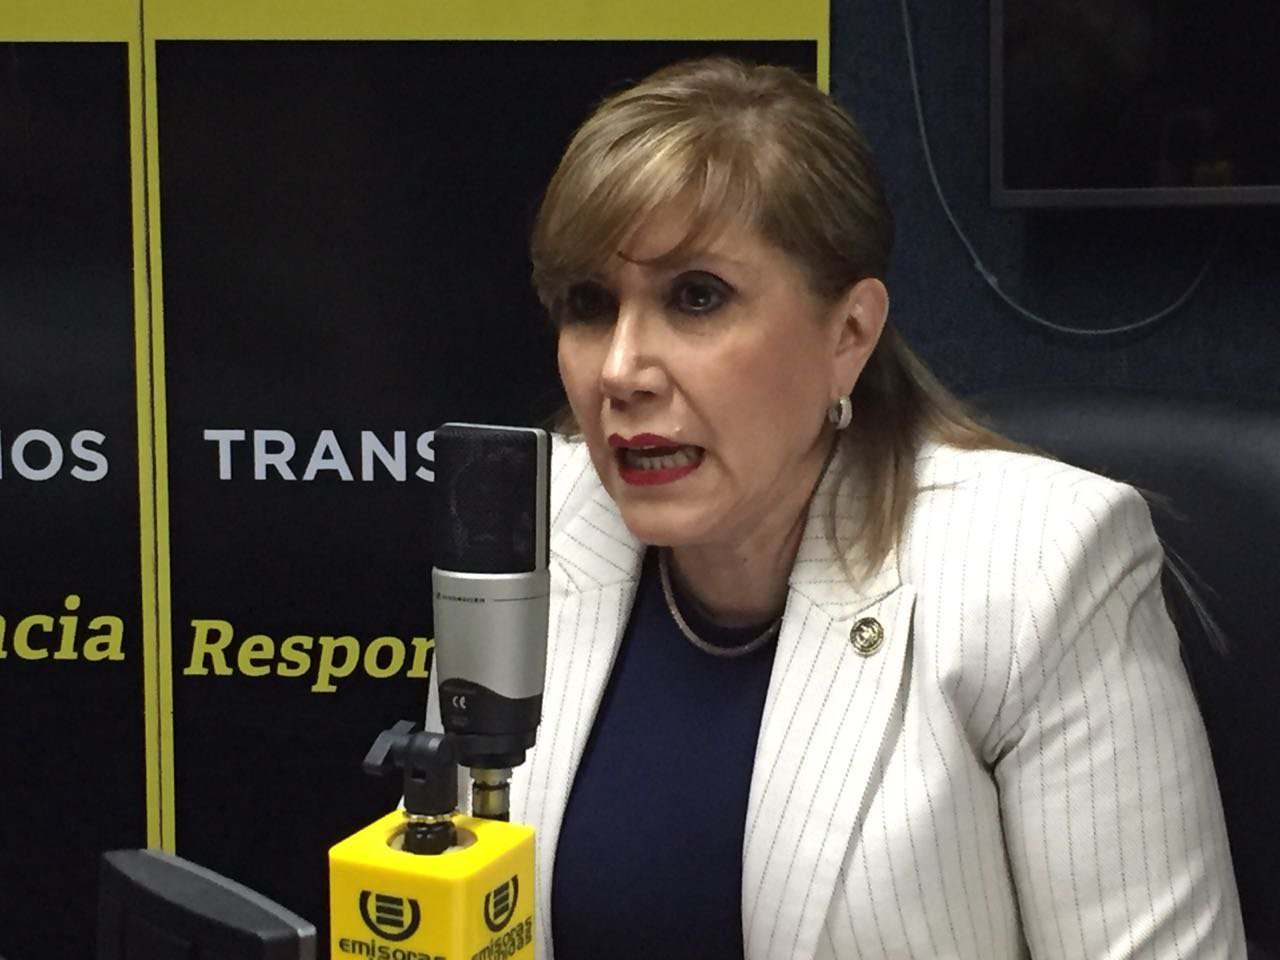 Dina Josefina Ochoa